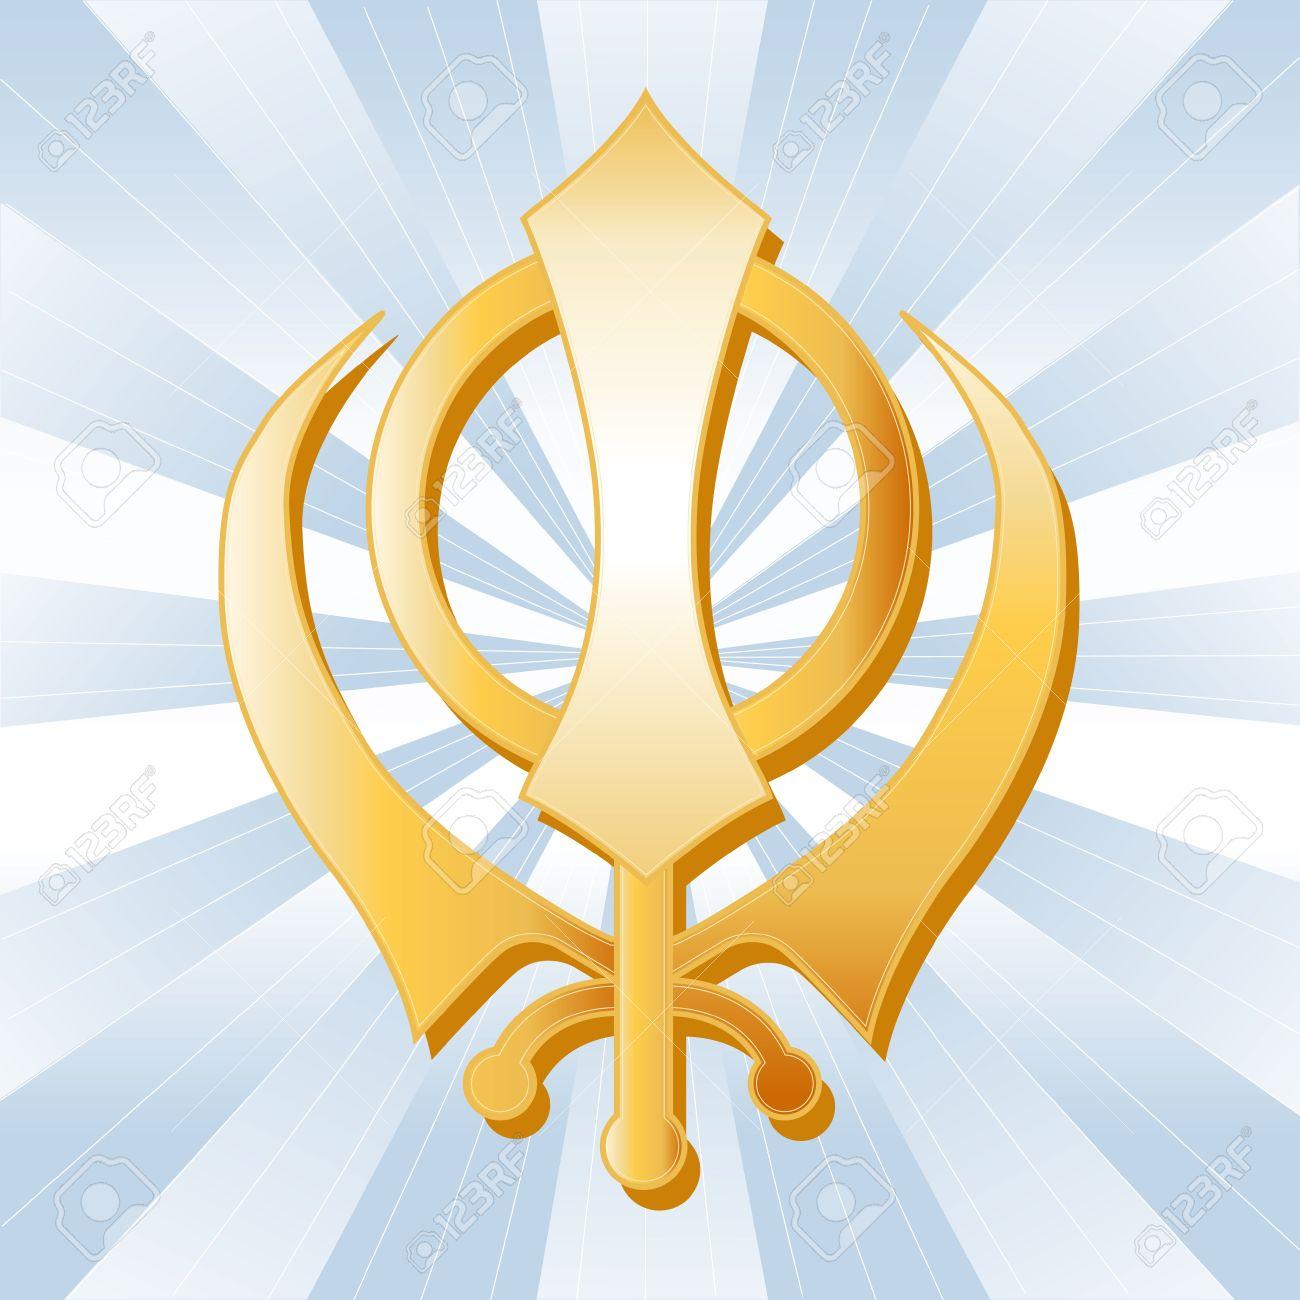 Sikh Symbol Golden Khanda Icon Of The Sikh Faith On A Sky Blue